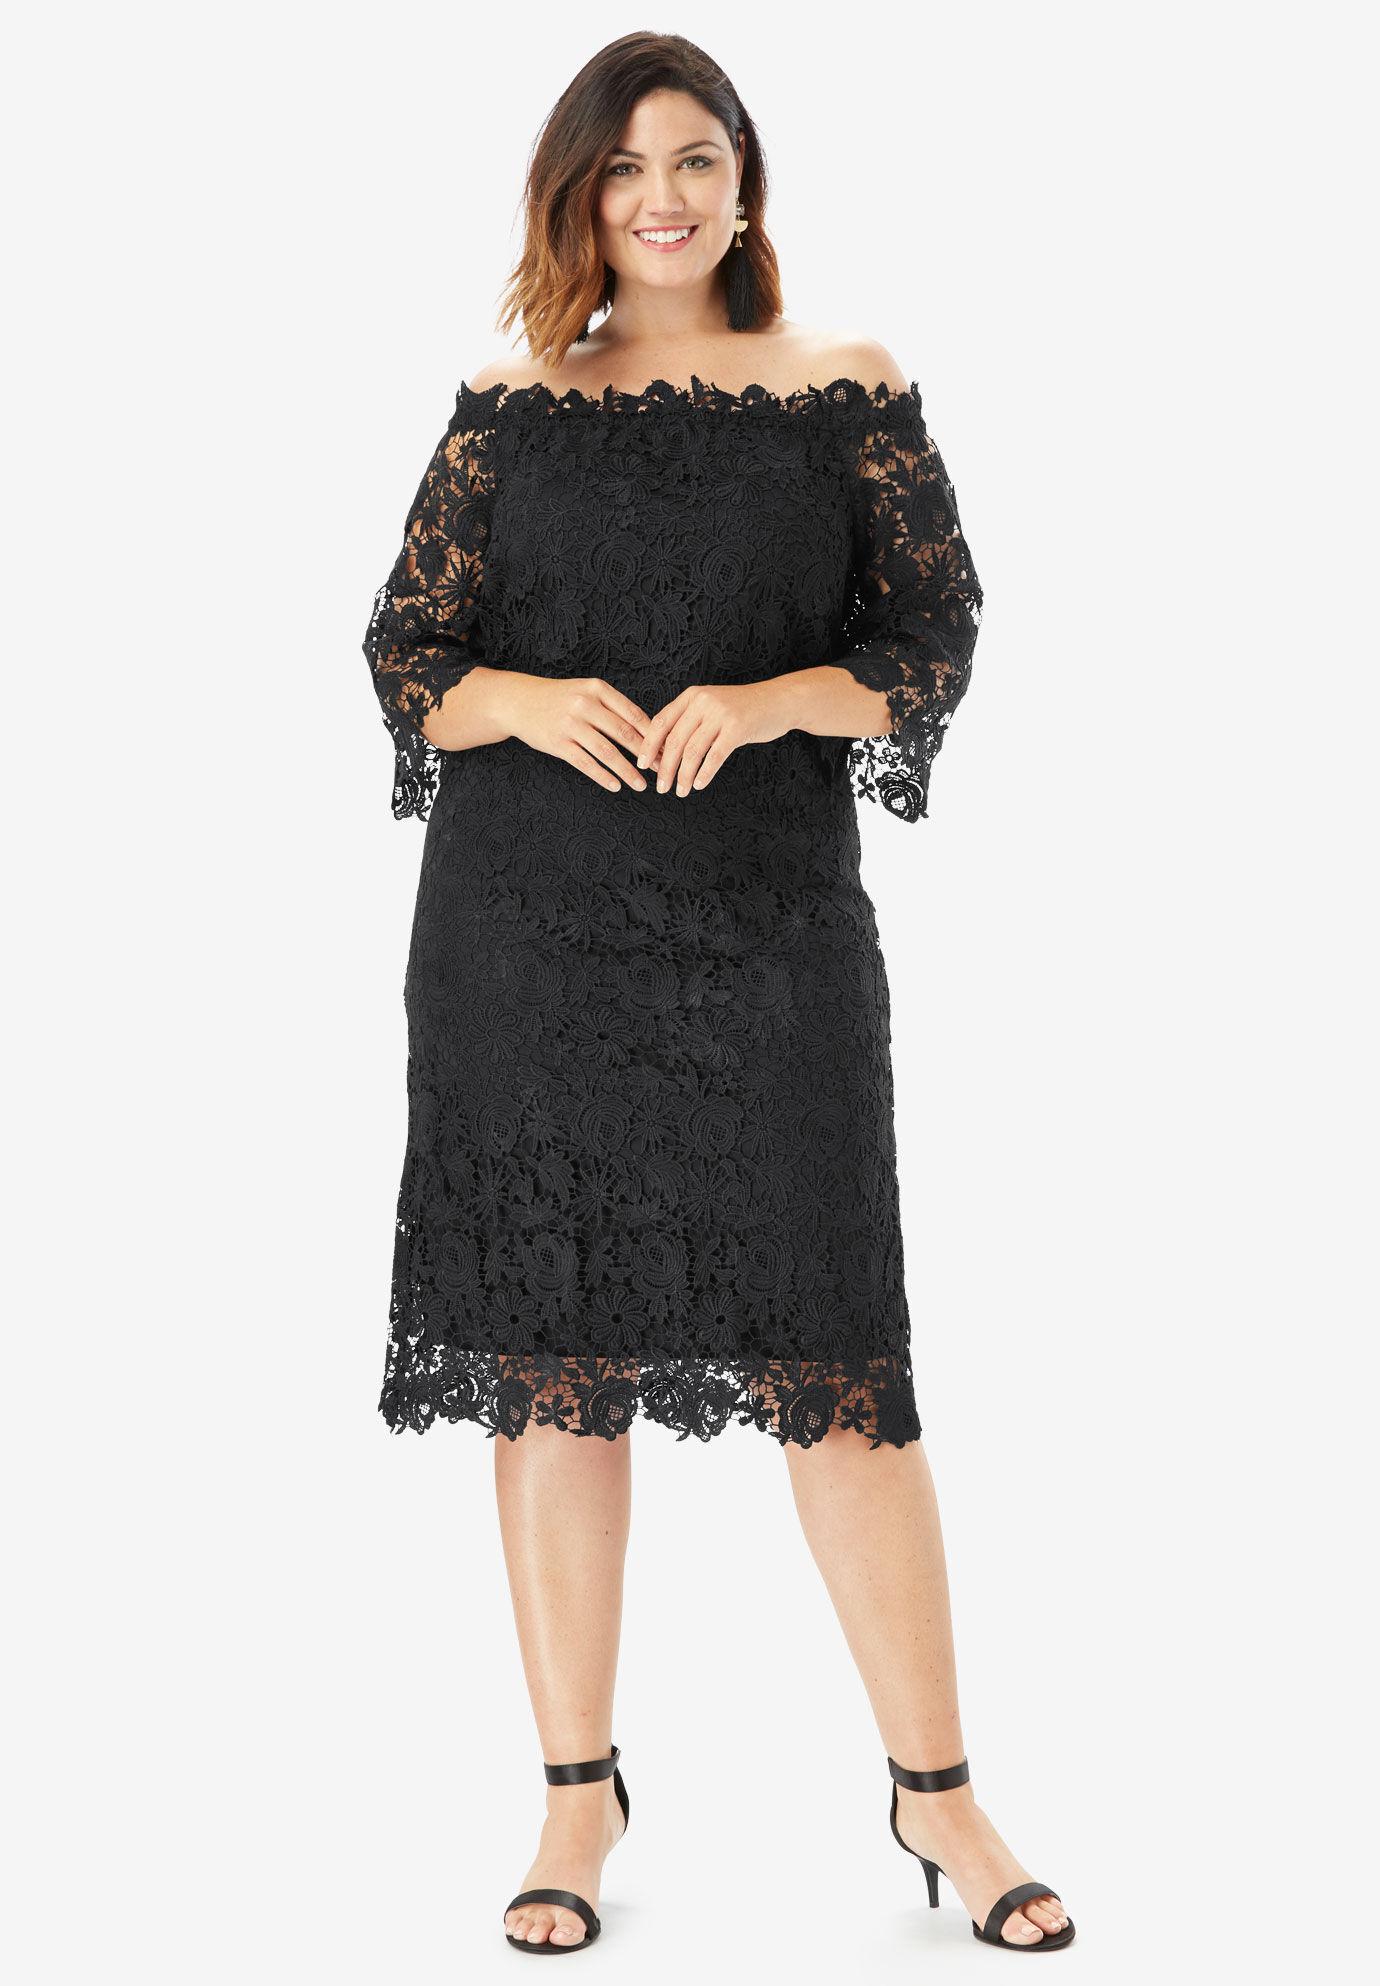 Plus Size Dressy Dresses